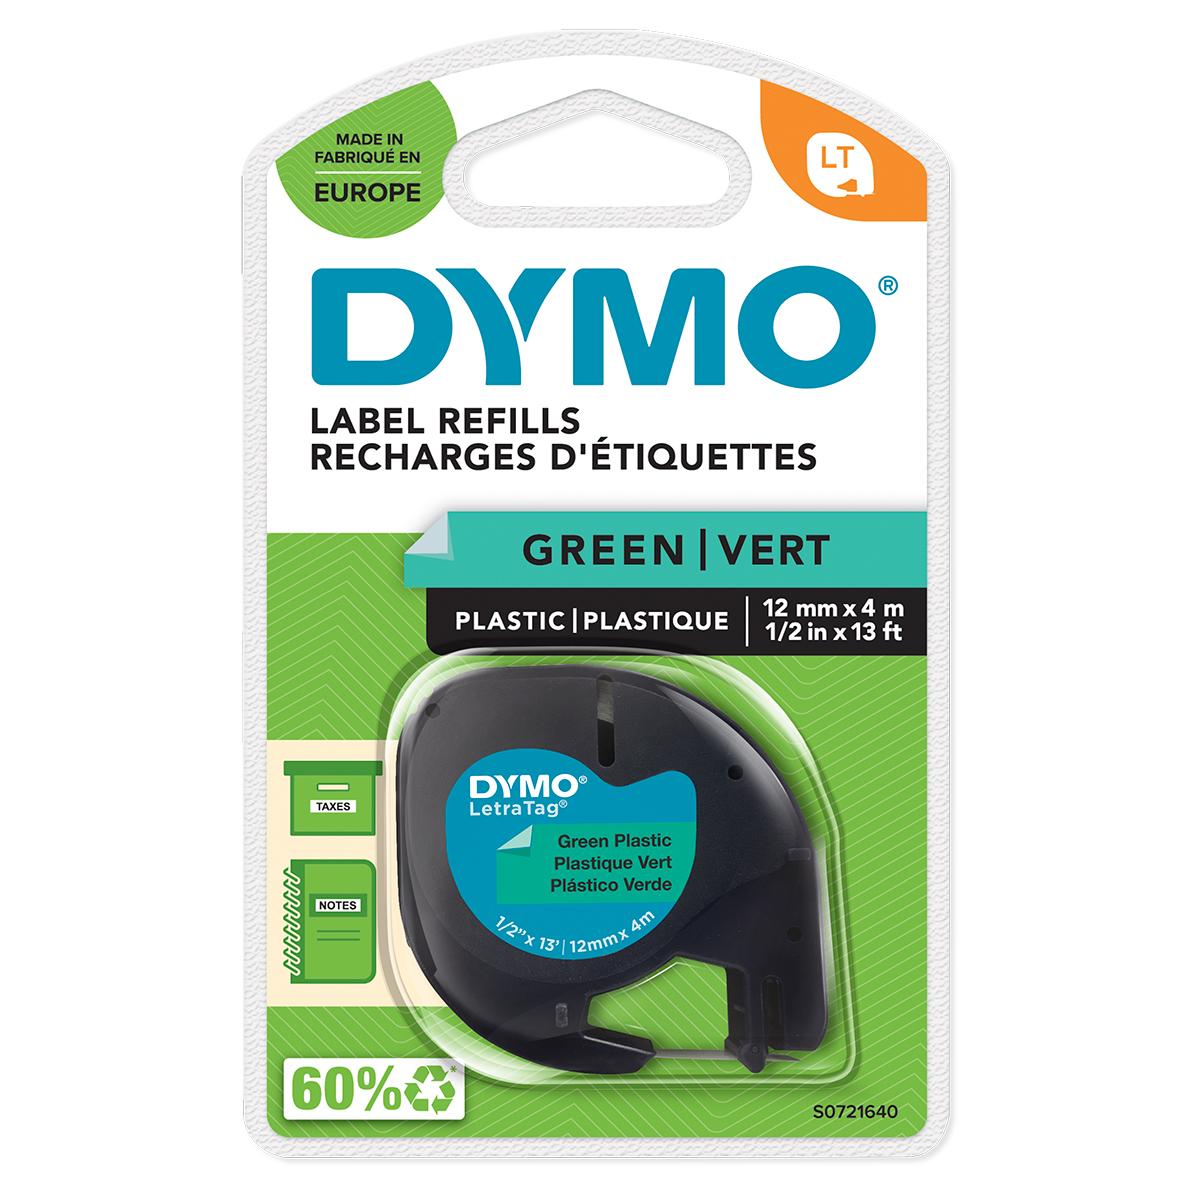 Dymo 91204 12mm x 4m Black On Green Plastic Tape